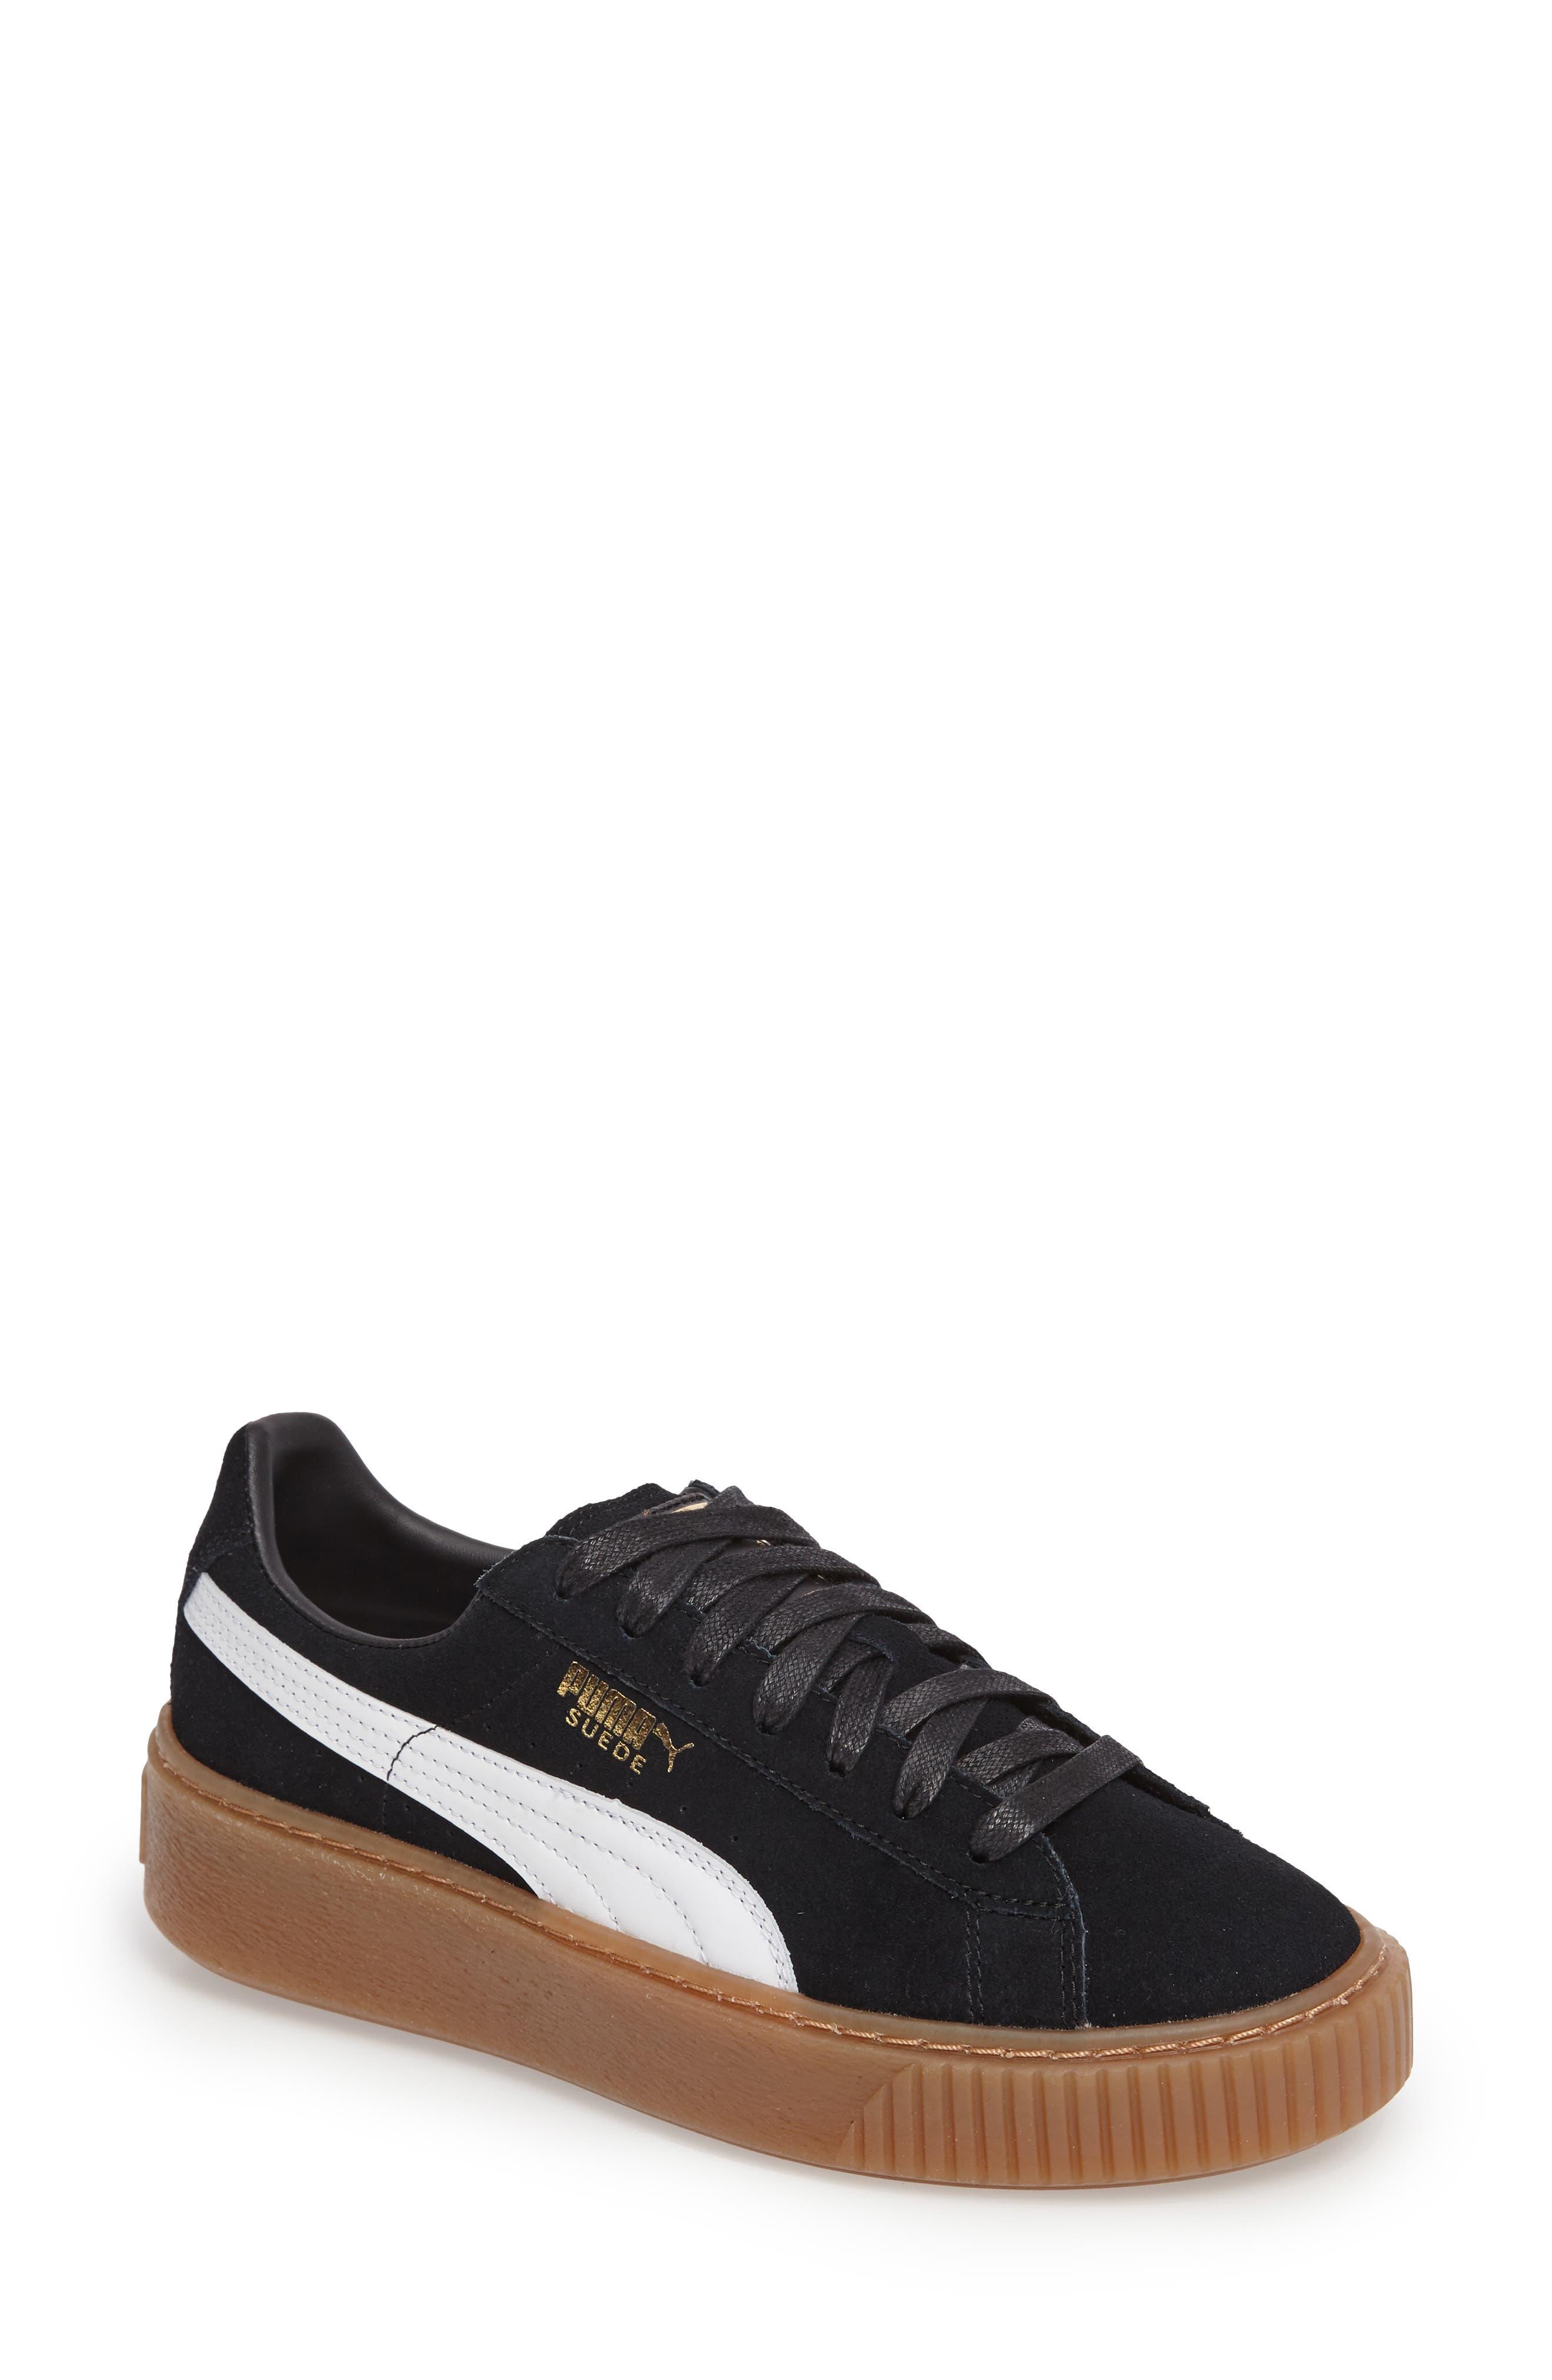 PUMA Suede Platform Core Sneaker, Main, color, 001